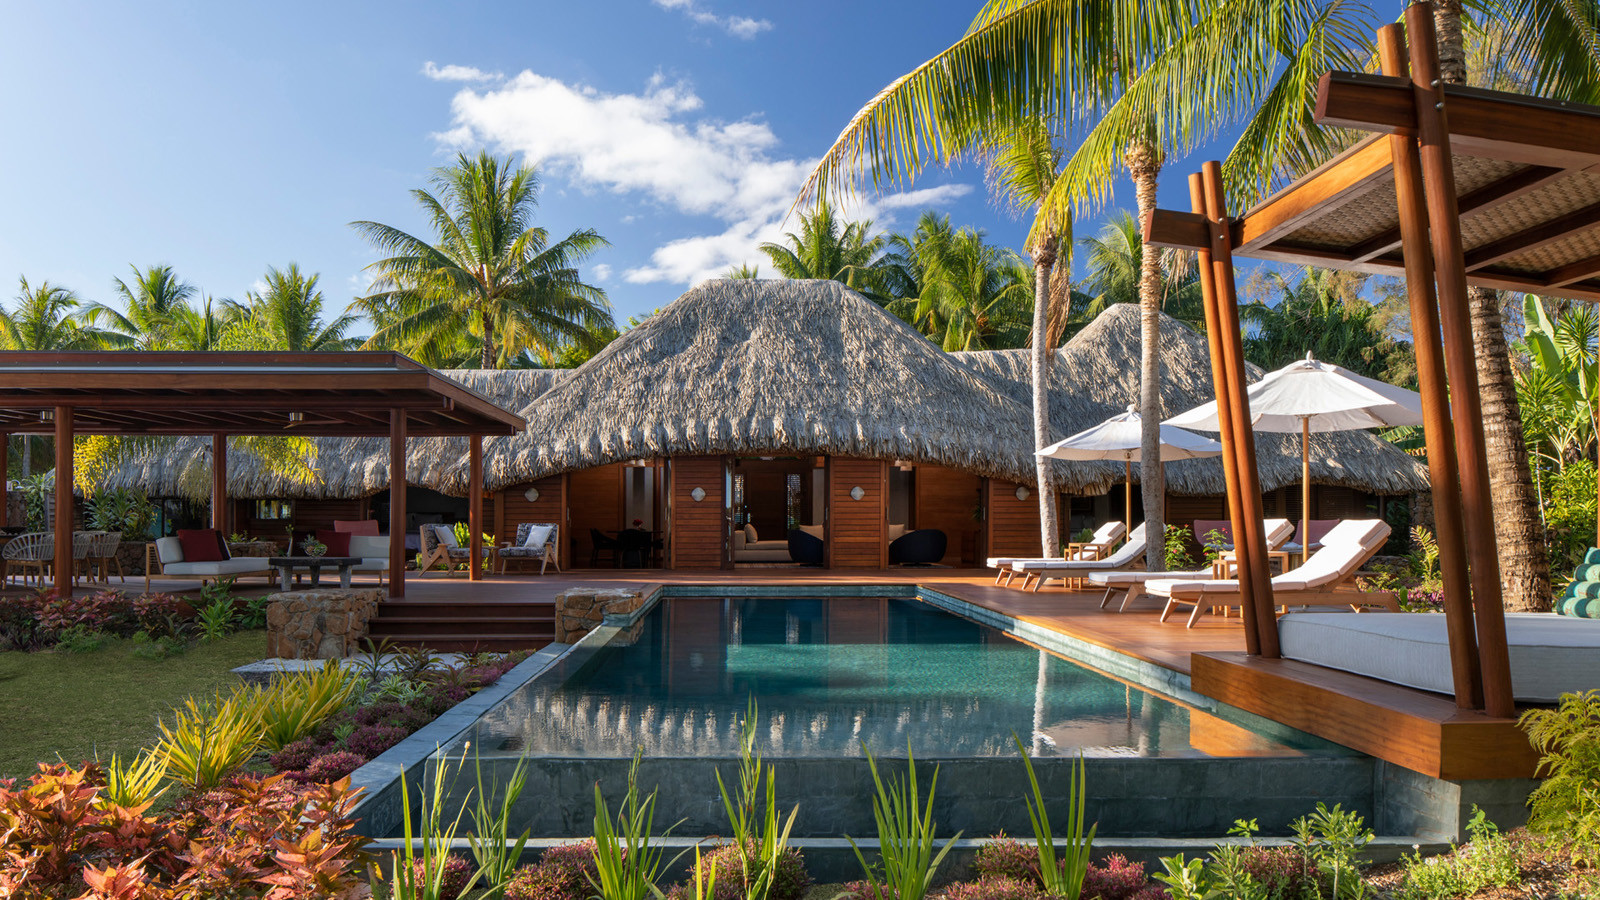 news-main-four-seasons-resort-bora-bora-announces-an-exclusive-partnership-with-artist-alain-despert.1584117470.jpg